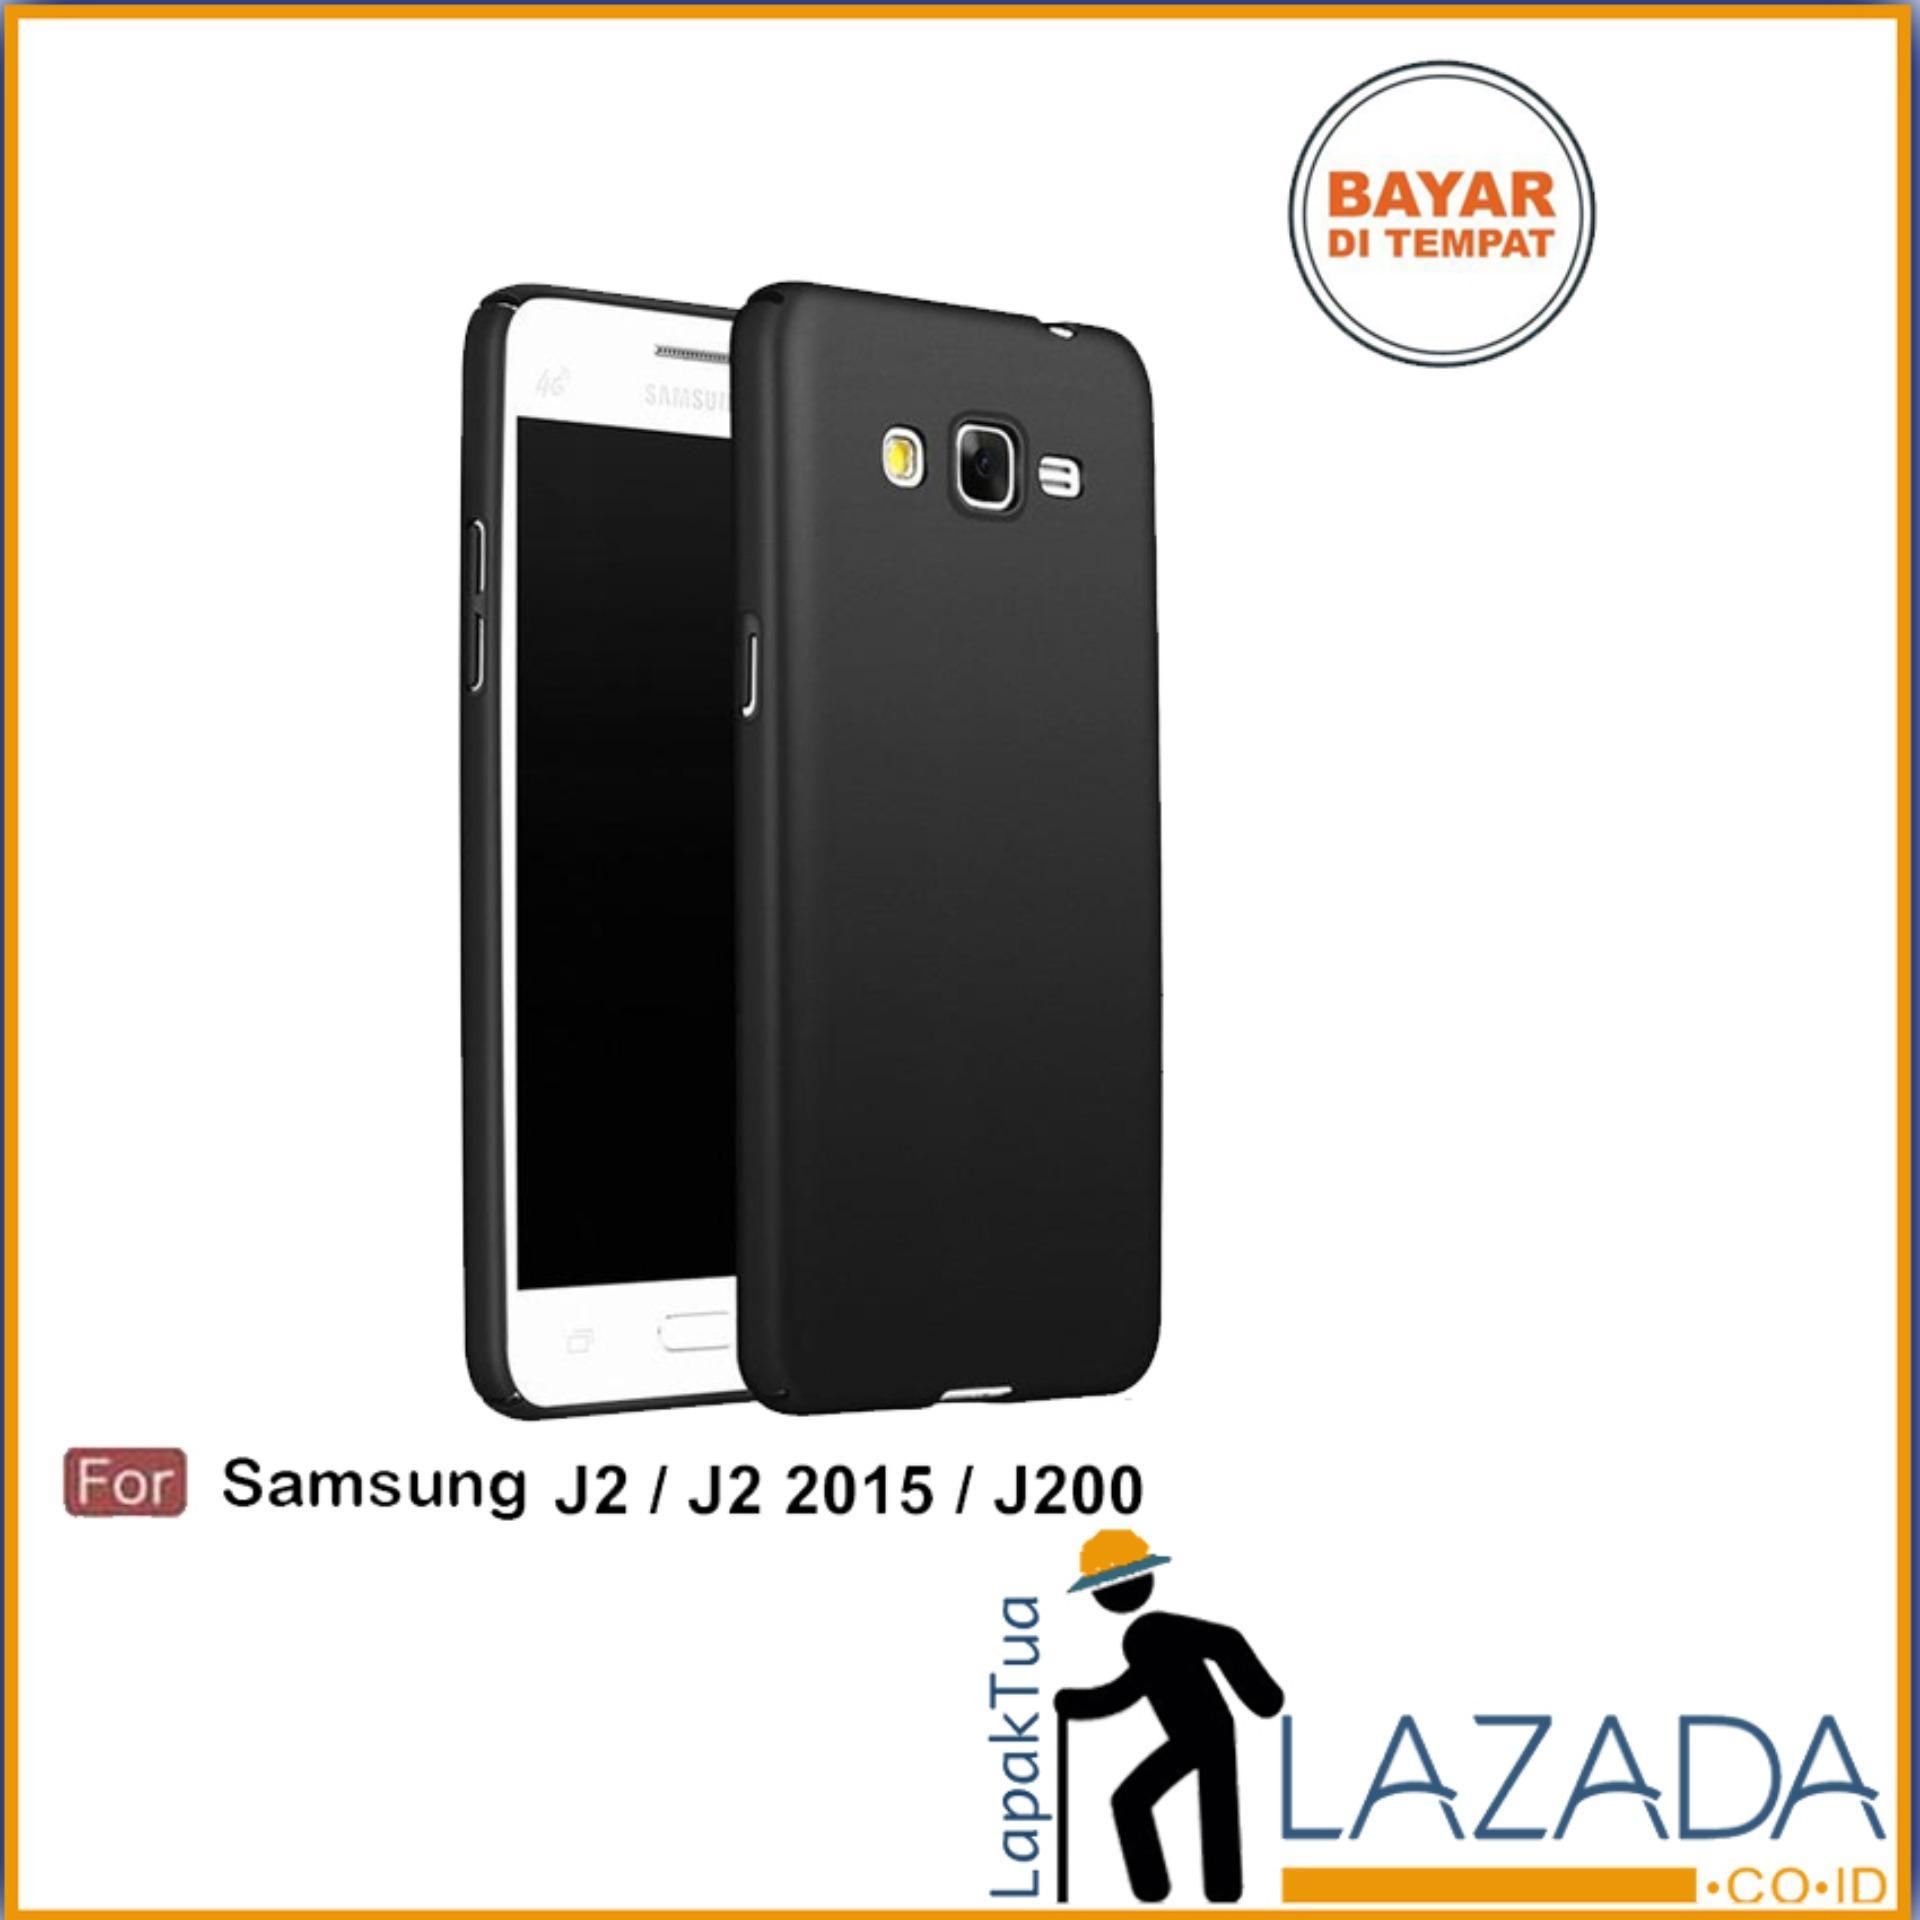 Lapak Case - Softcase Midnight Black Matte Case Ultraslim Baby Skin Untuk Samsung Galaxy J2 / J200 / J2 2015 / J2 Duos / J200G